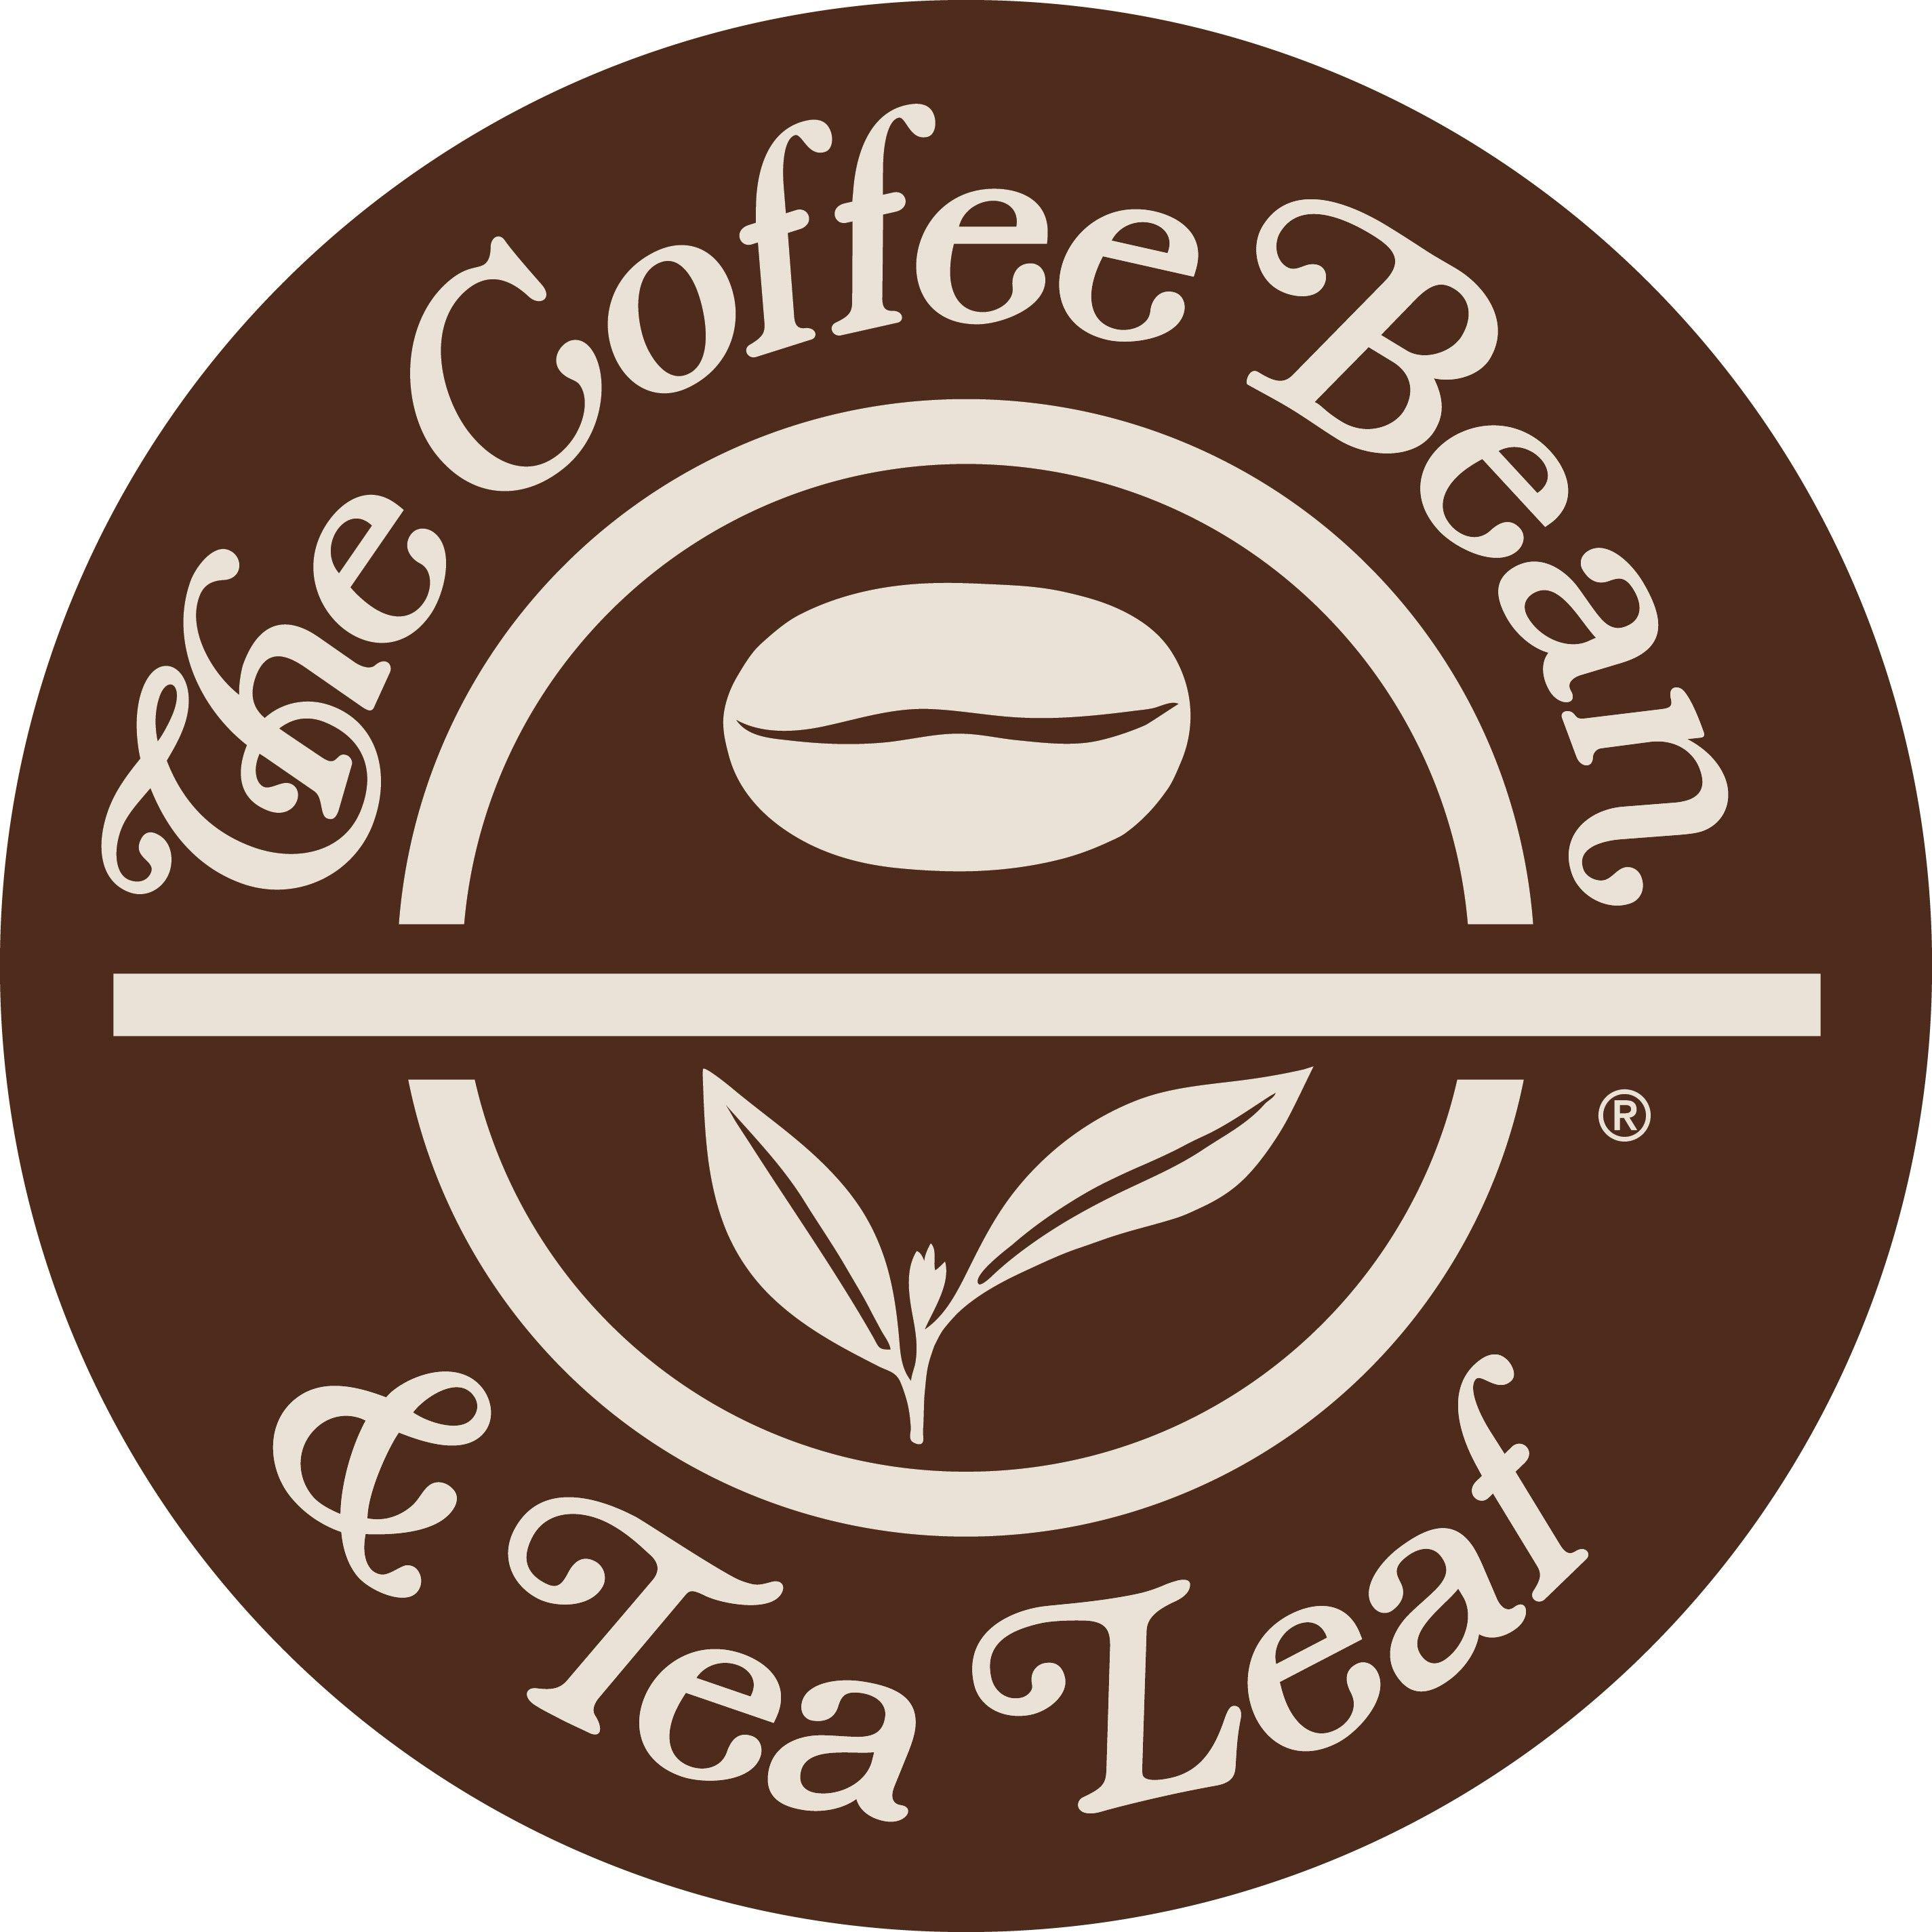 Coffee Bean And Tea Leaf Head Office In 2020 Coffee Beans Tea Leaves Fancy Coffee Drinks